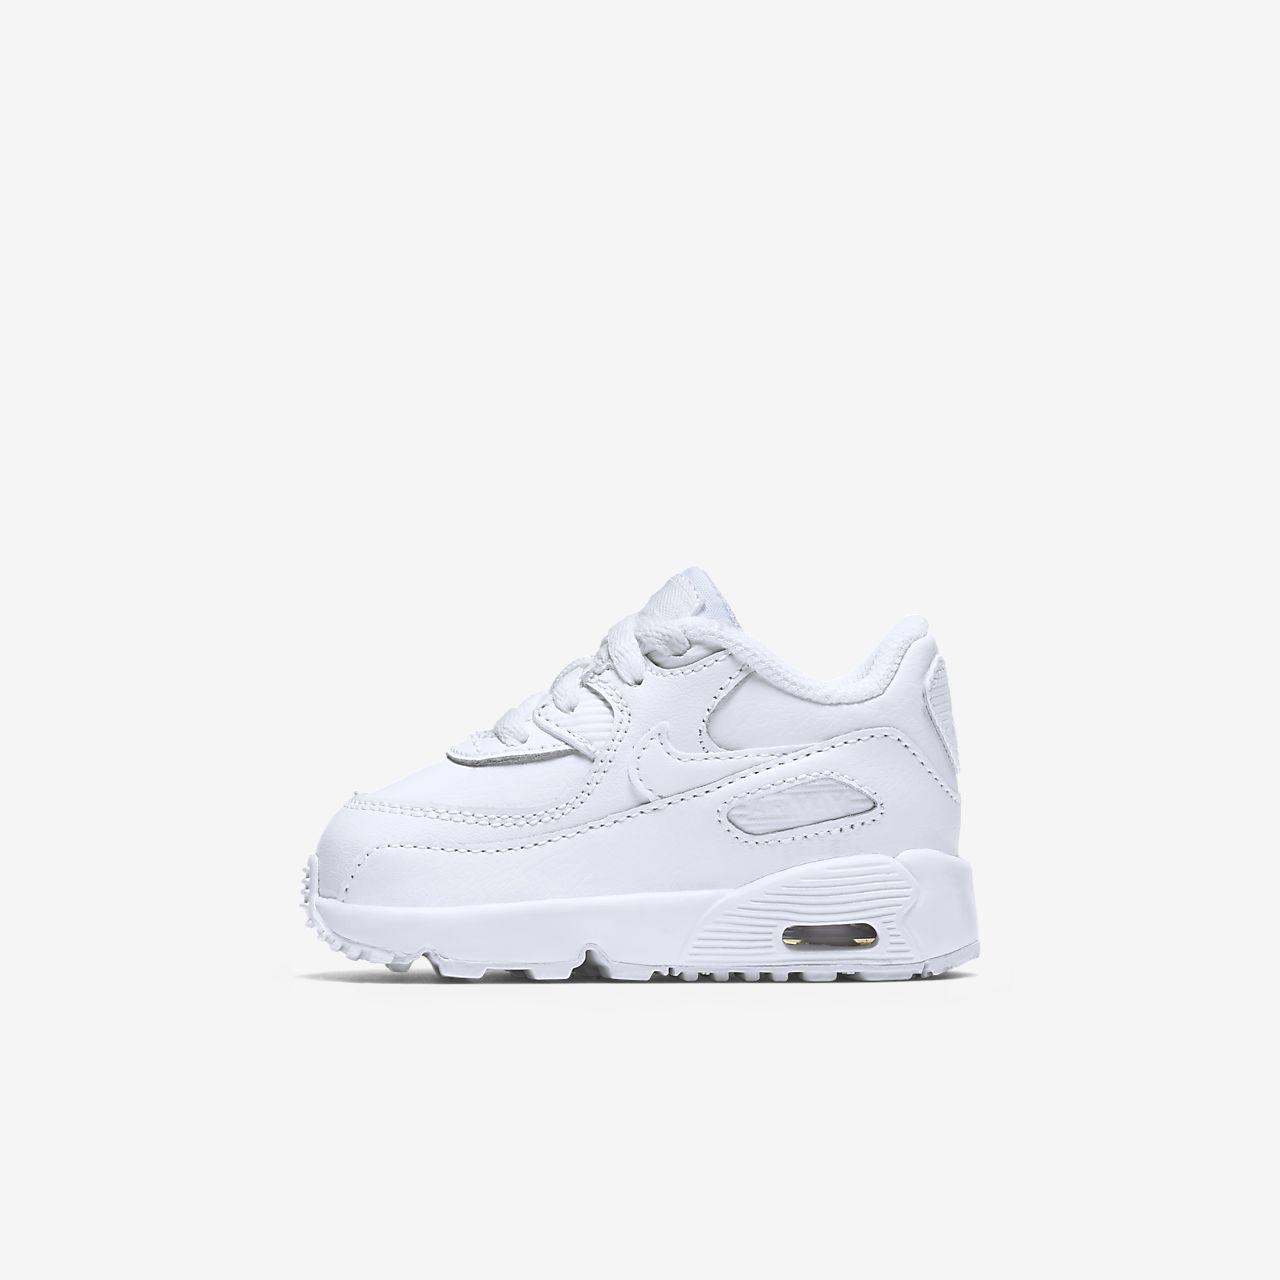 ... Chaussure Nike Air Max 90 Leather pour Petit enfant